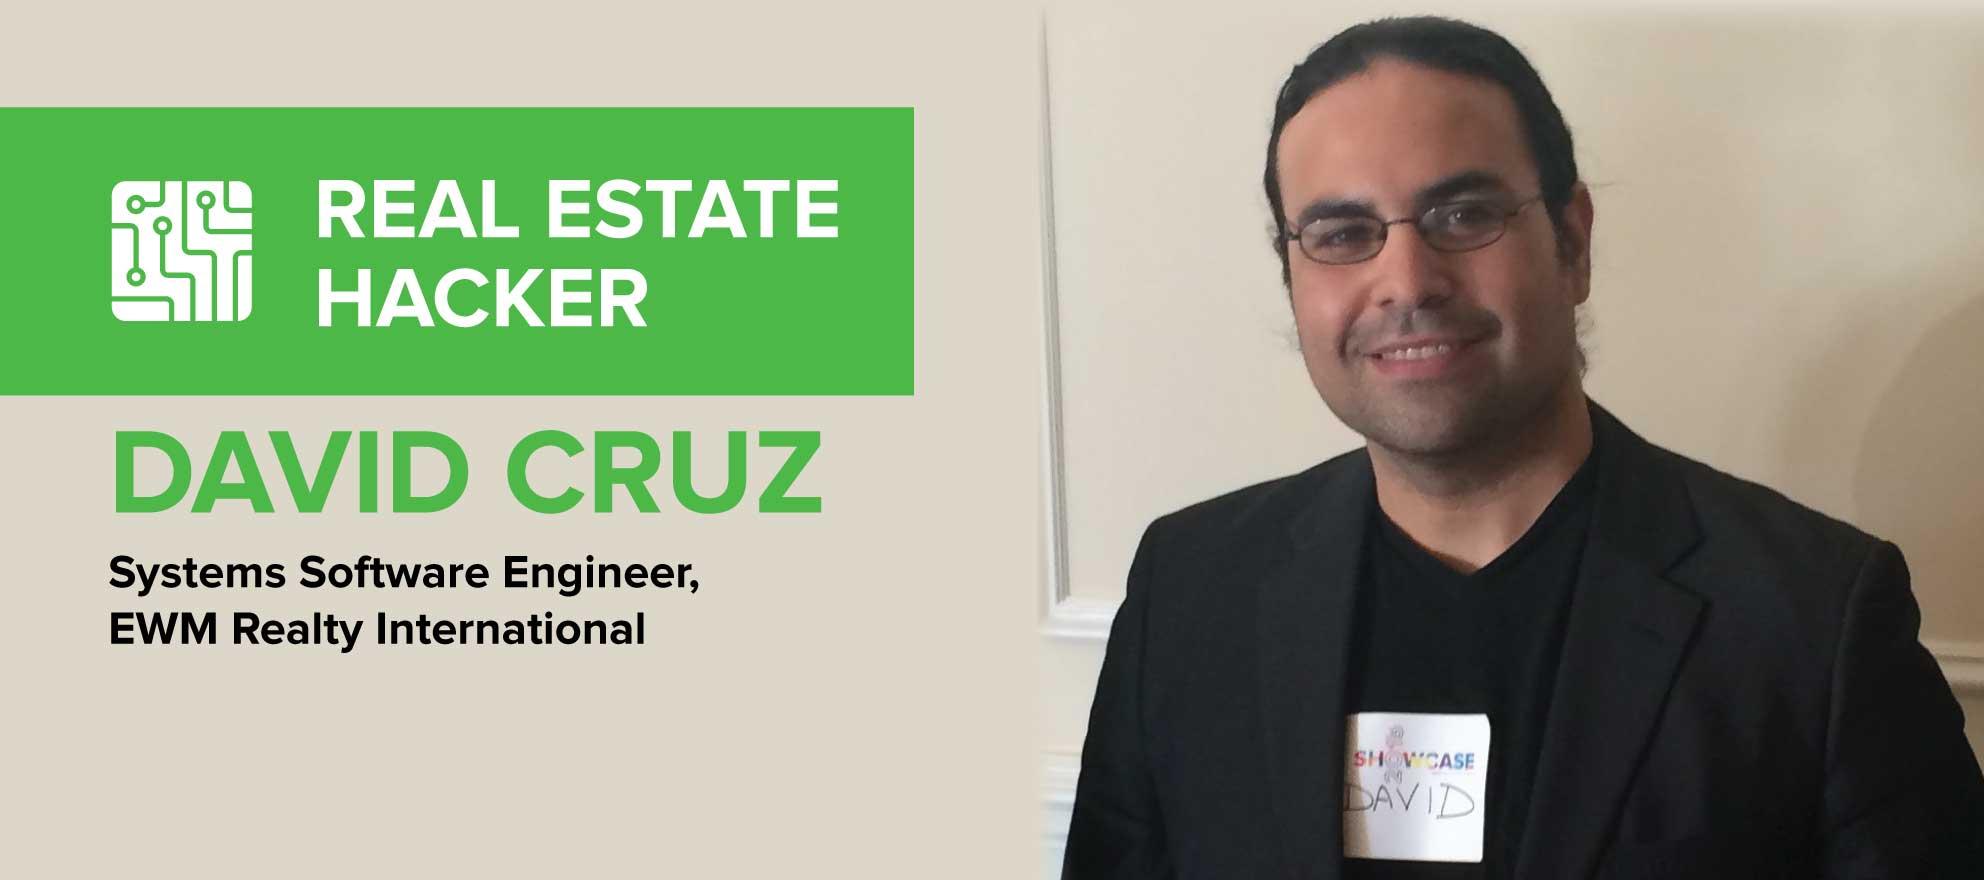 David Cruz: 'I maximize our agents' visibility'